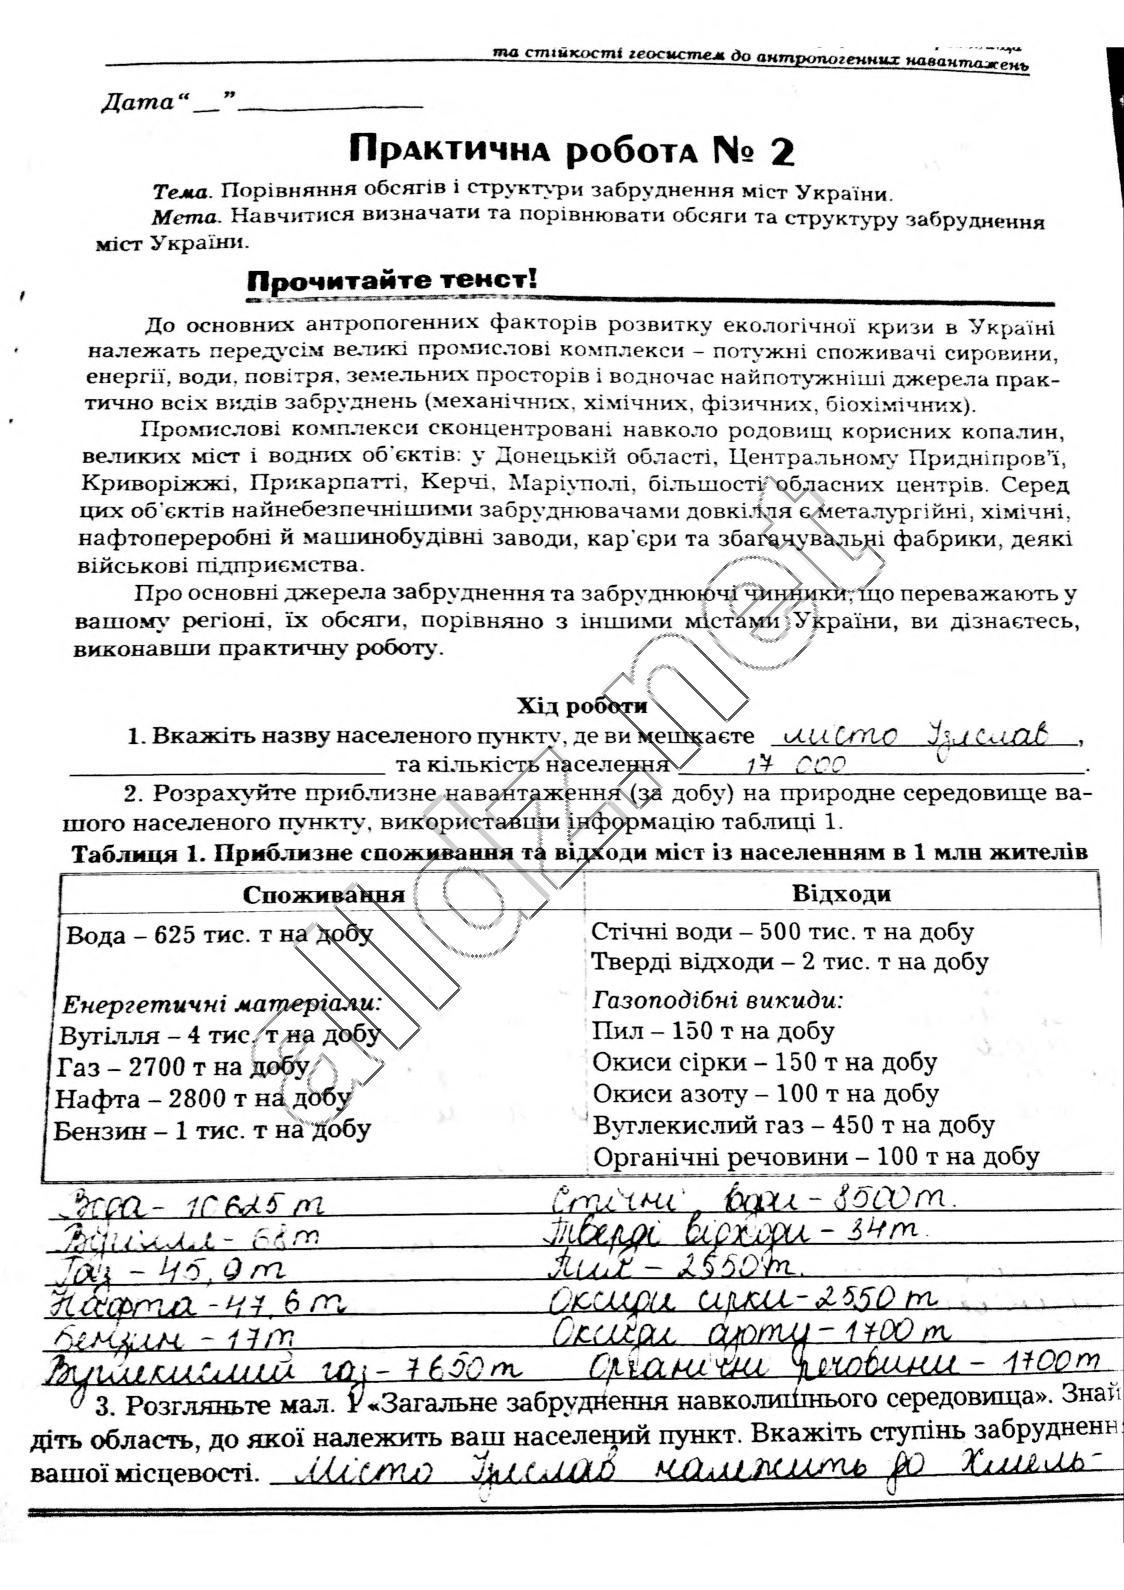 гдз екологя 11 клас шаламова-харченко вдповд